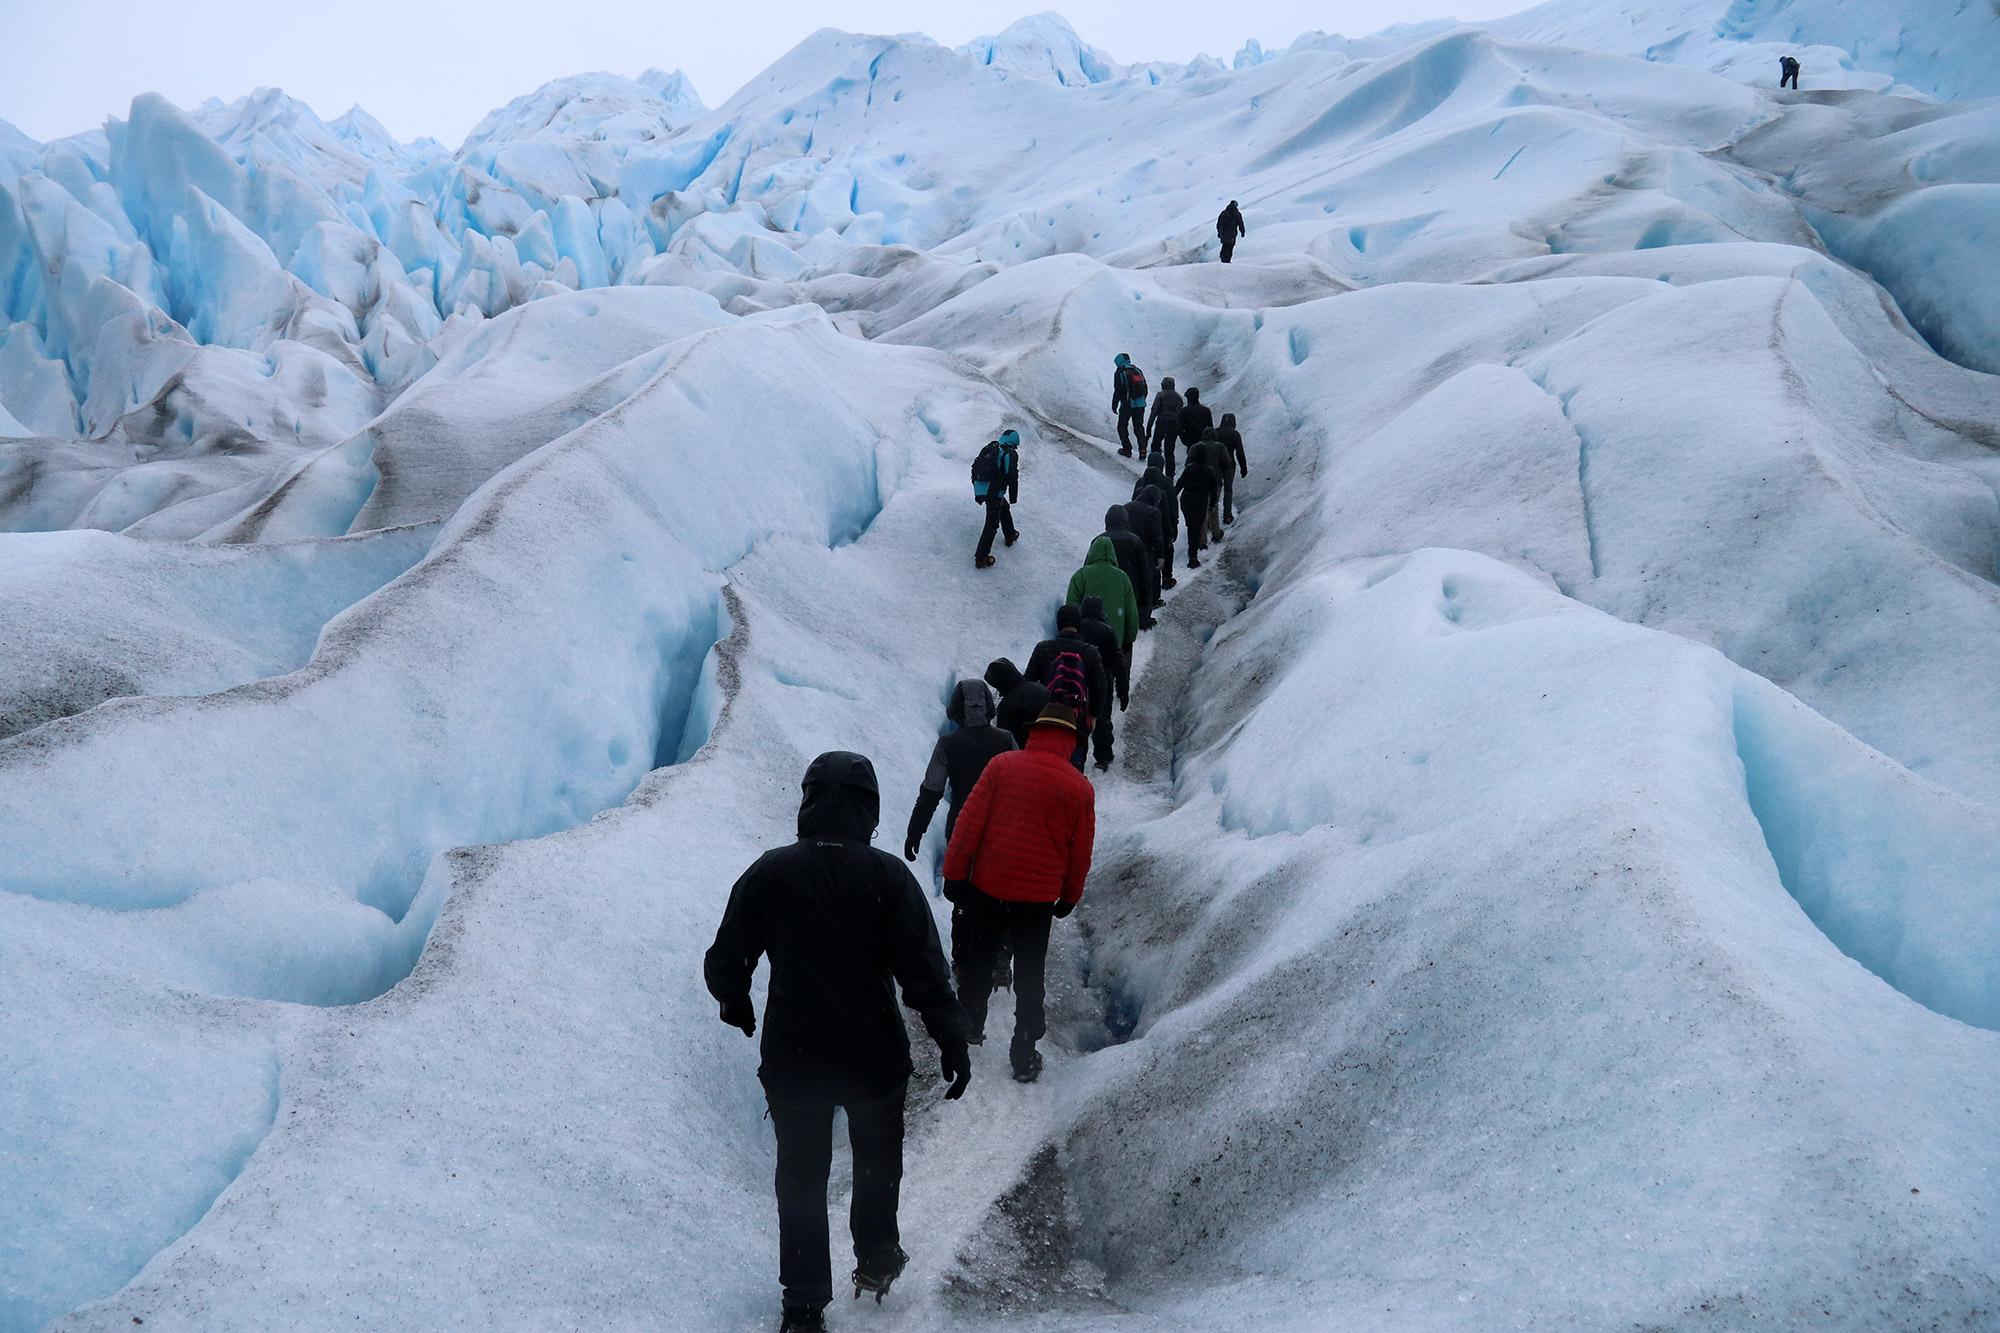 Reisverslag Patagonië - Perito Moreno - Parque Nacional Los Glaciares